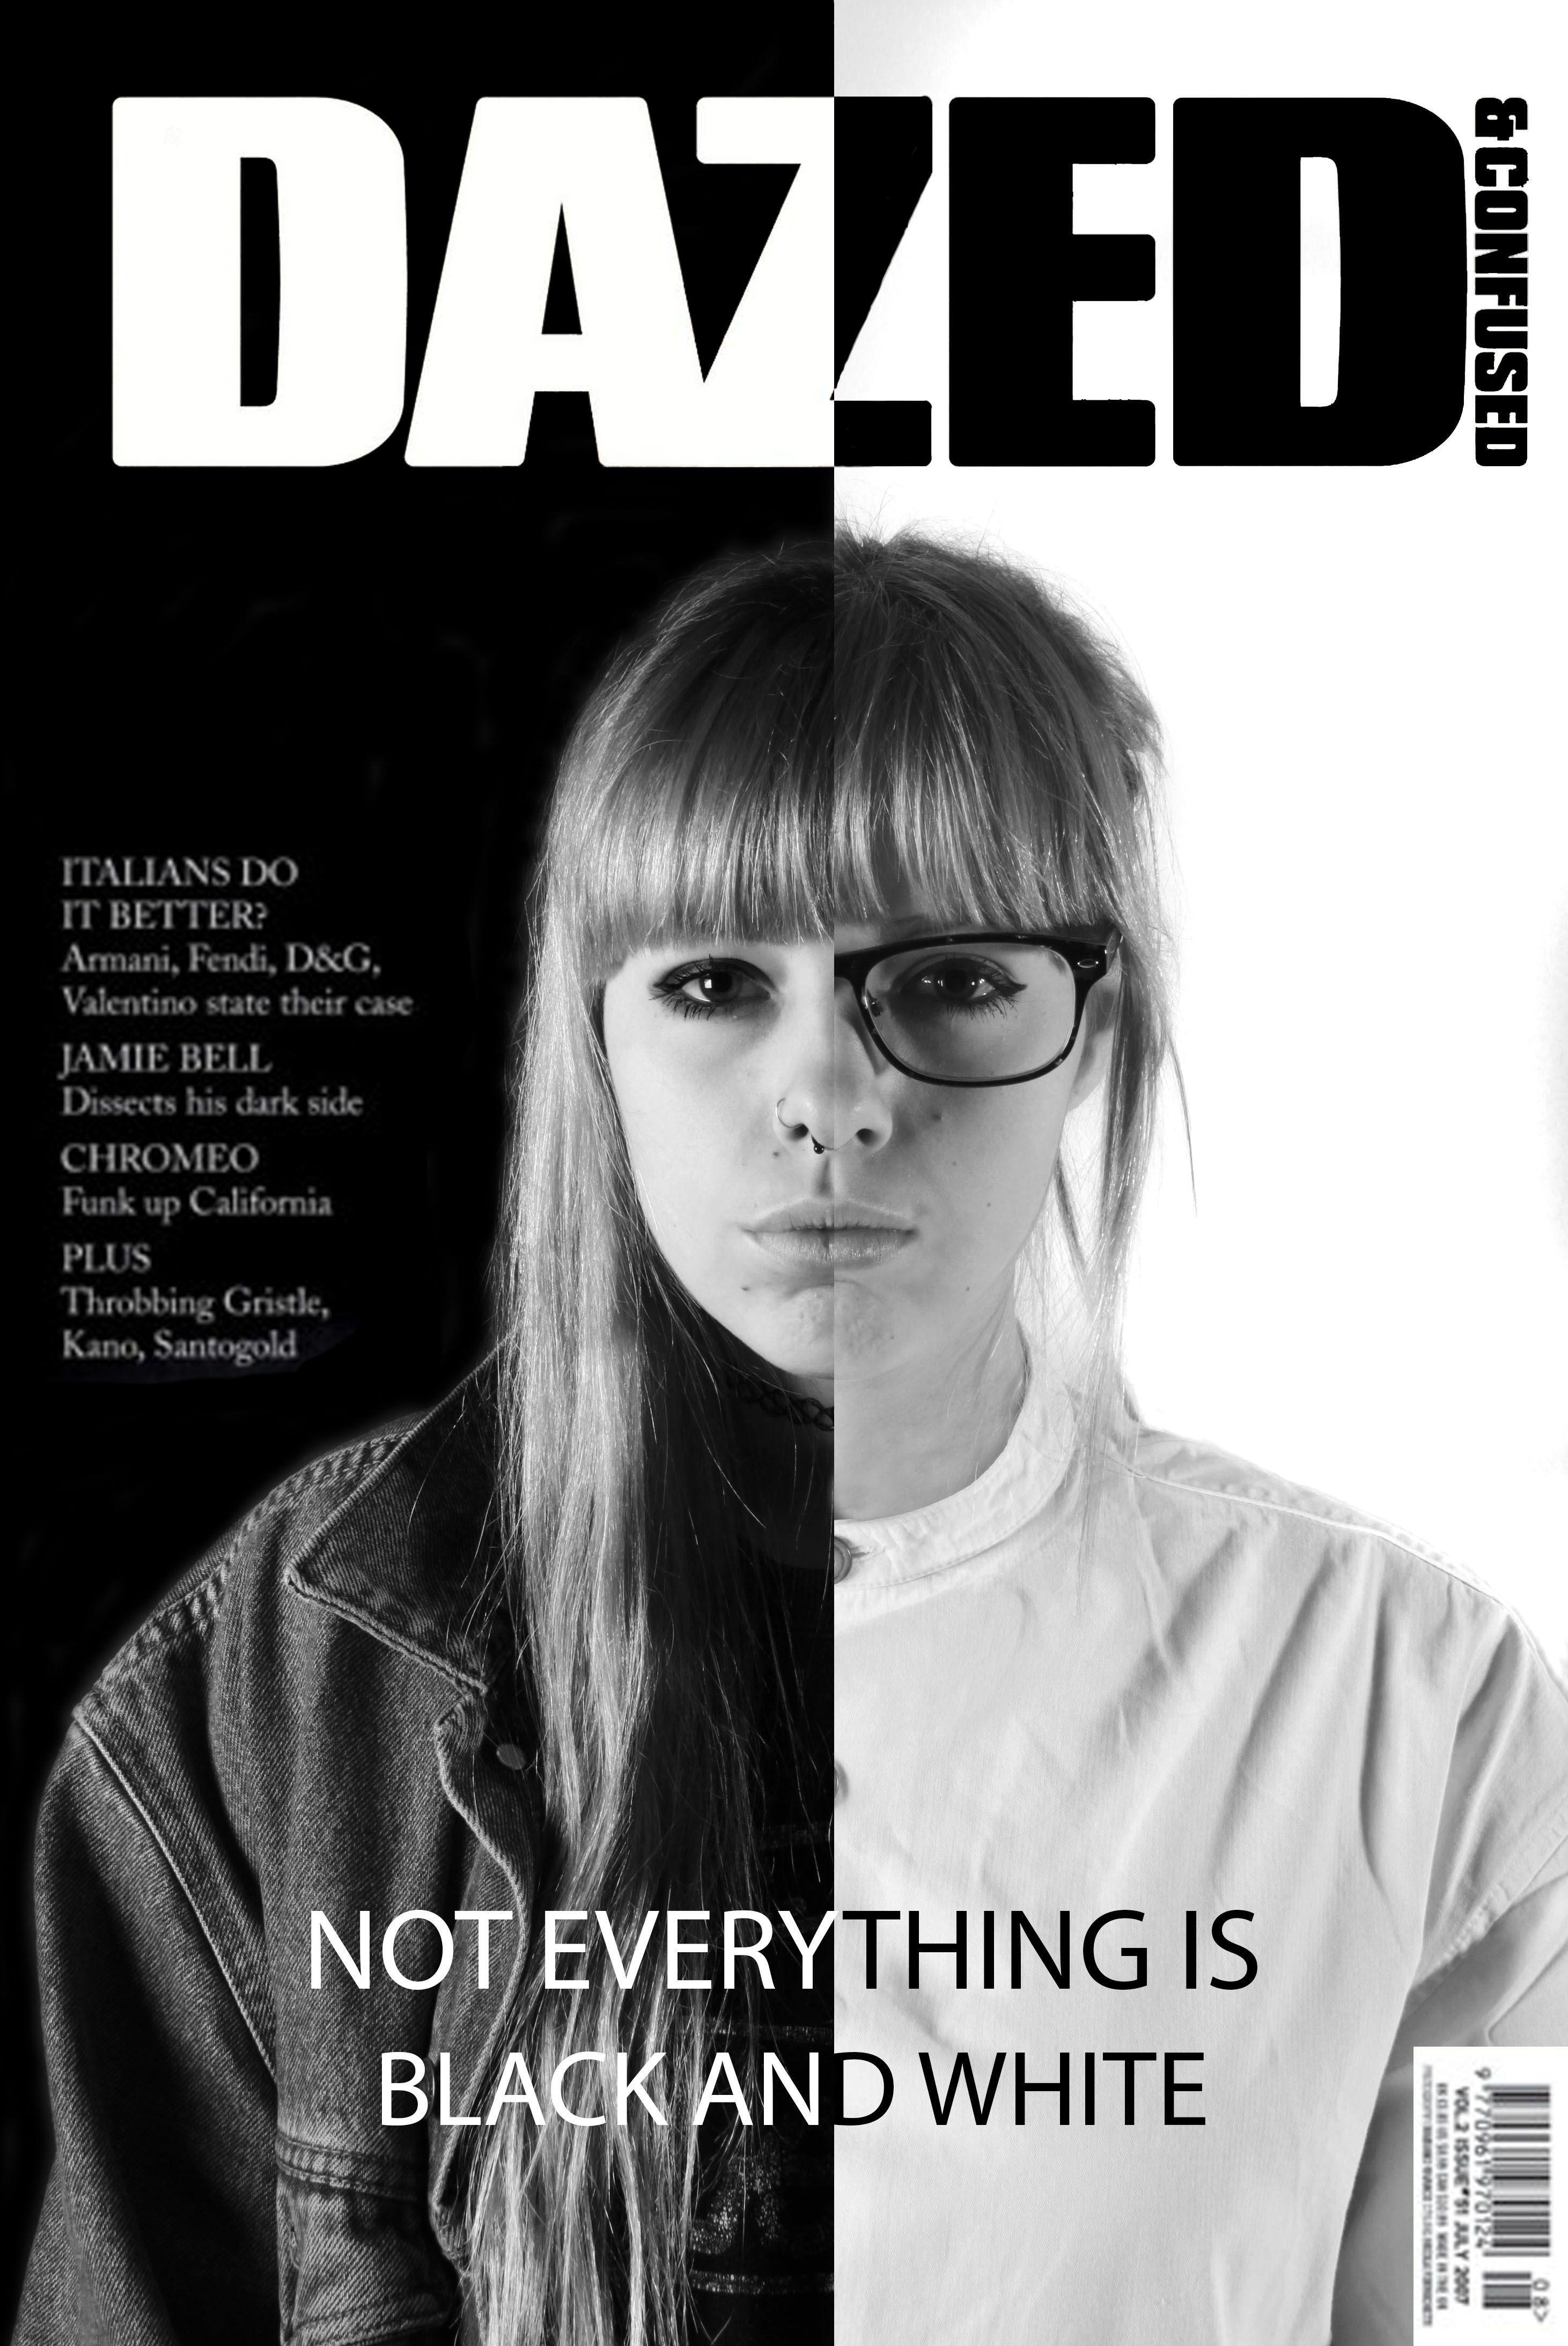 Cover Magazines Magazine Design Cover Magazine Cover Layout Magazine Cover Ideas